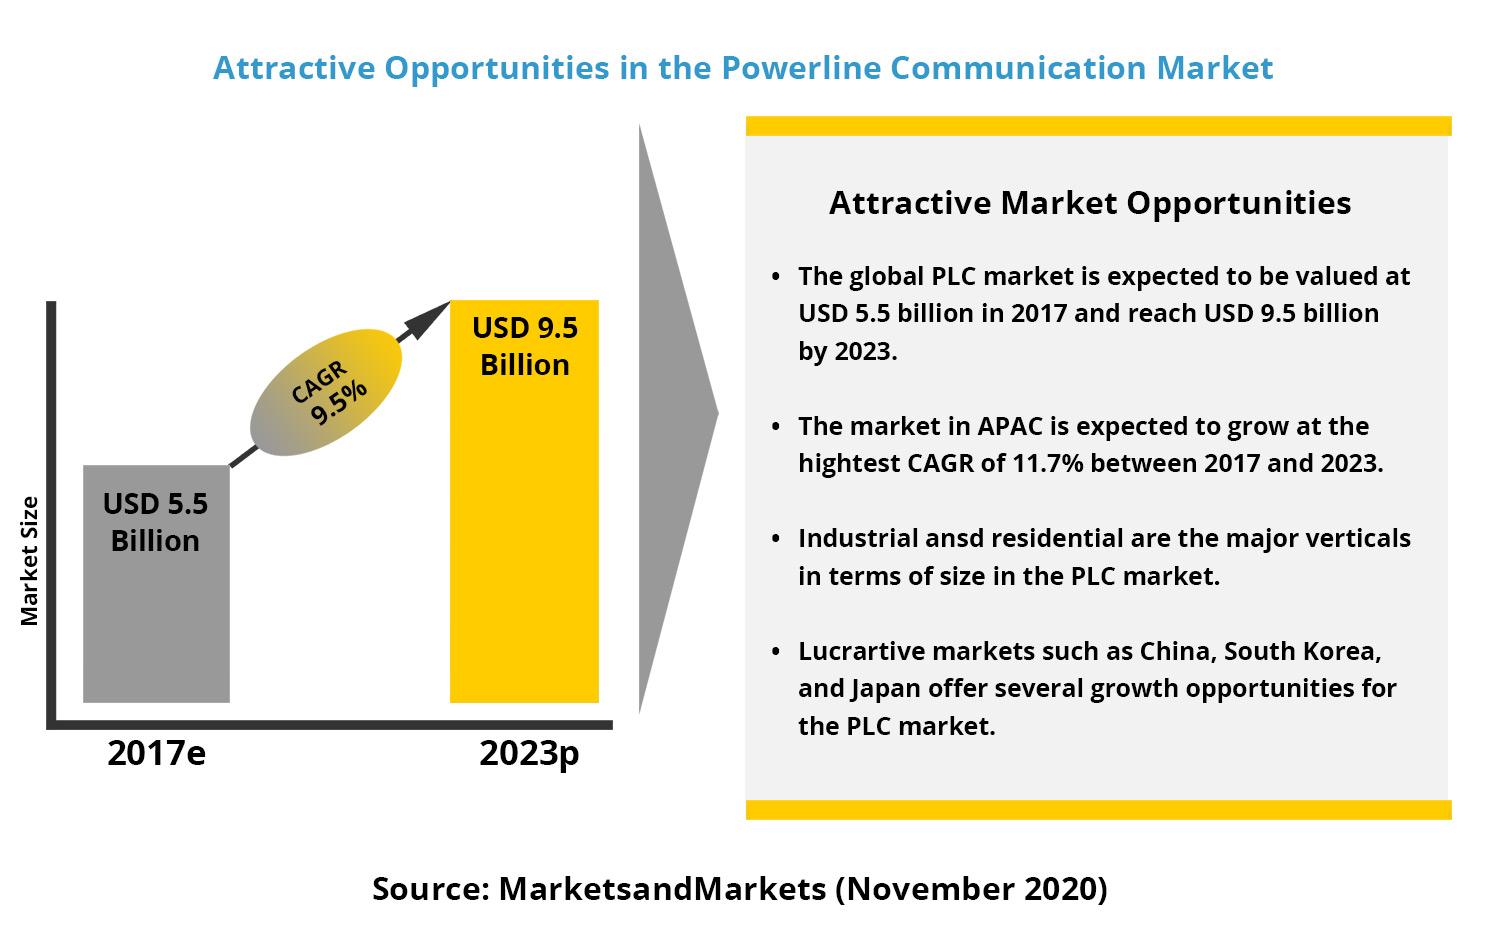 PLC Market opportunities